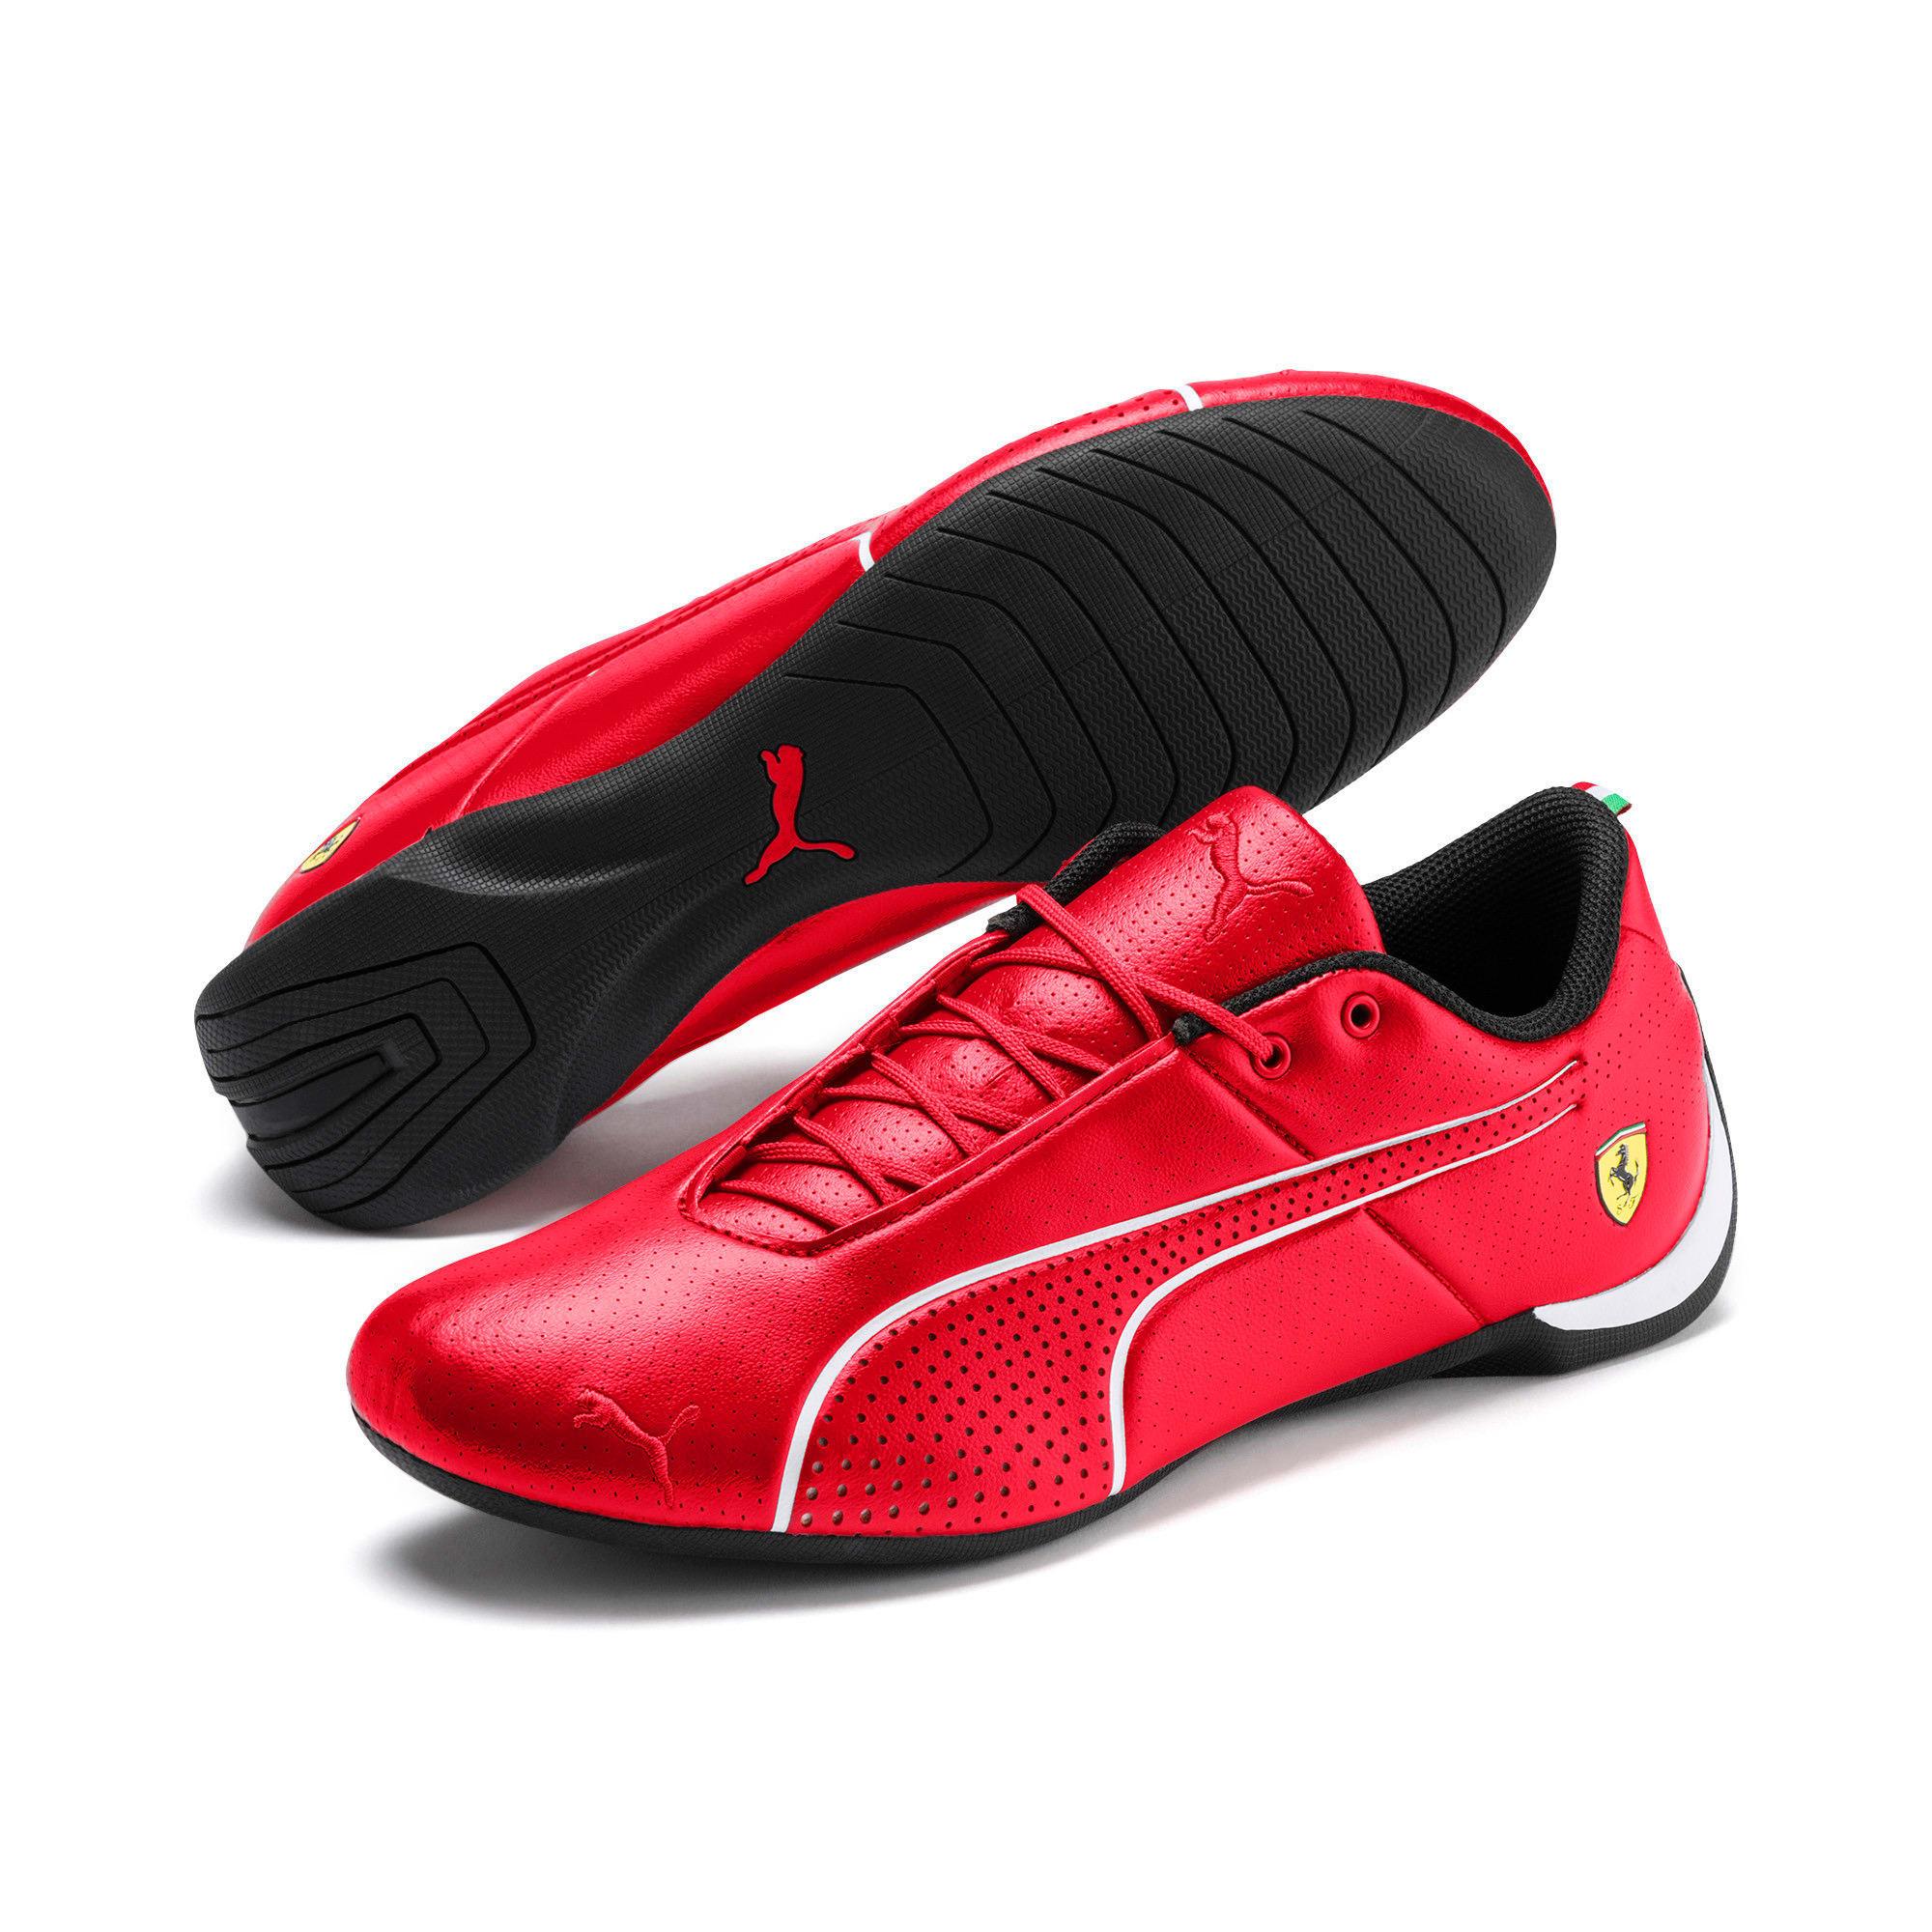 Thumbnail 6 of Ferrari Future Cat Ultra Trainers, Rosso Corsa-Puma White, medium-IND